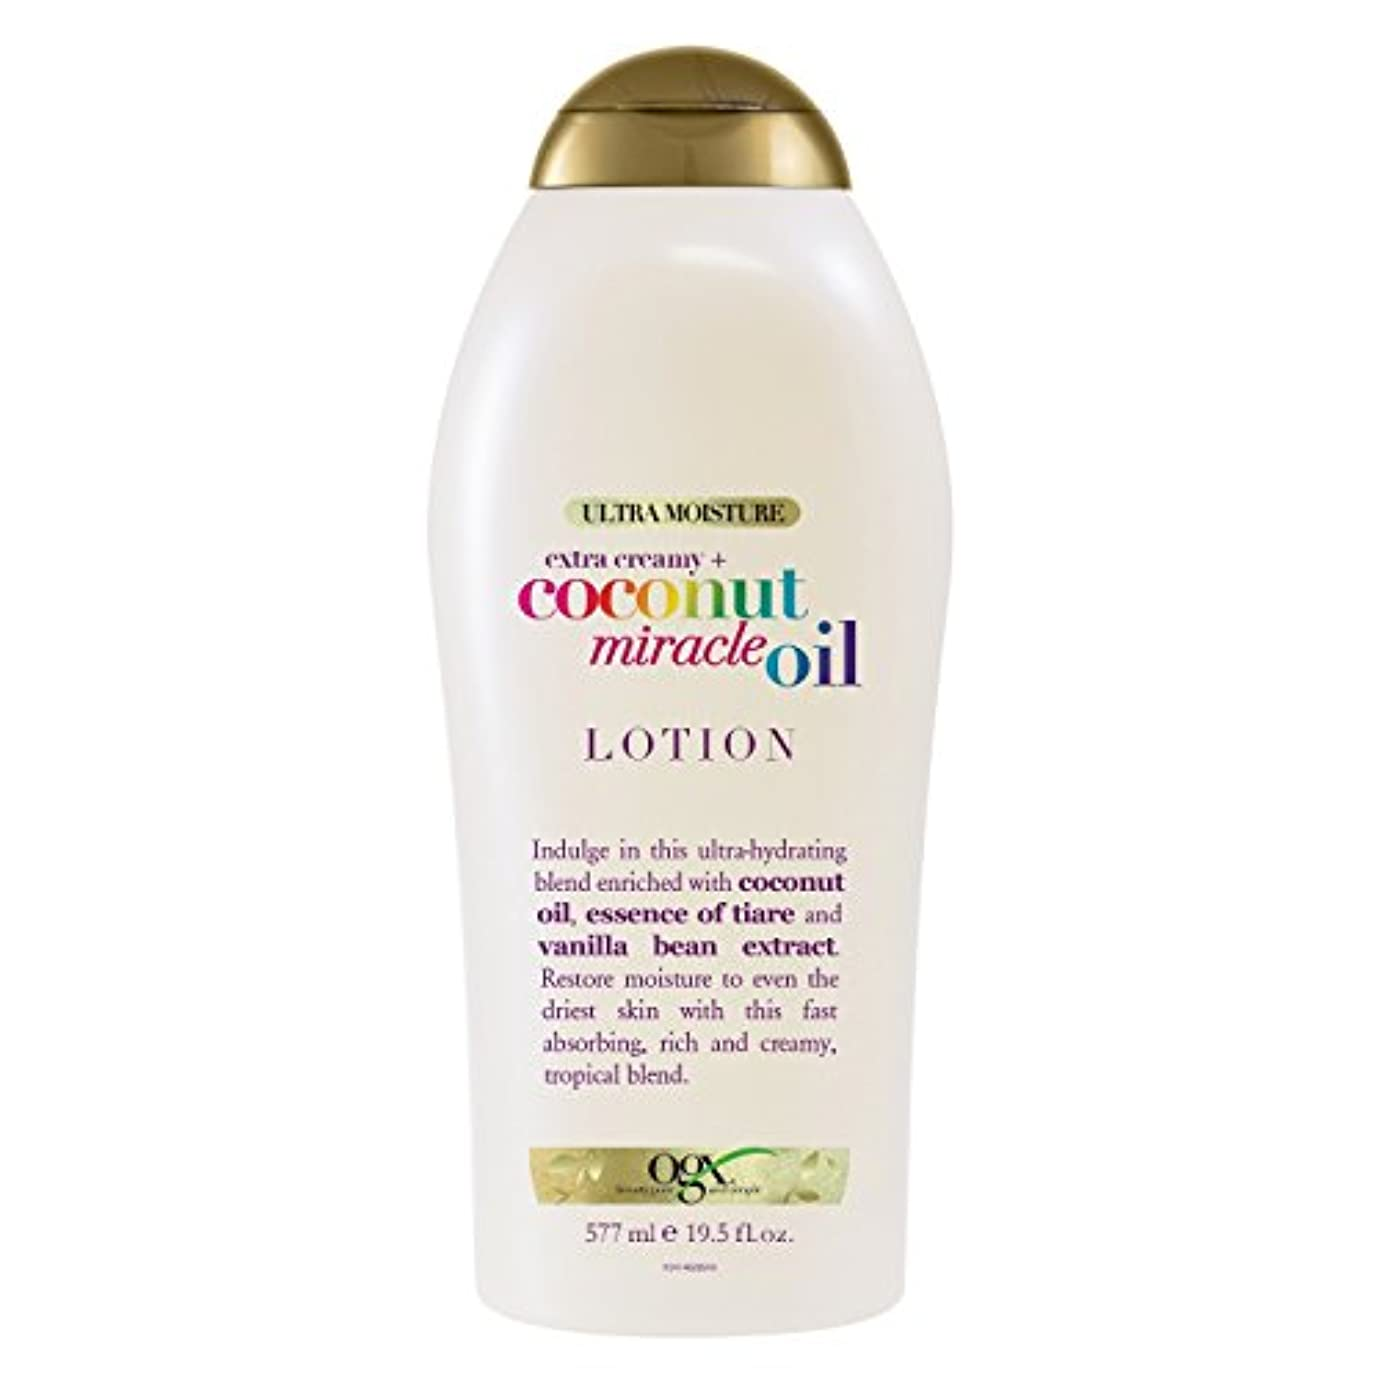 OGX ミラクル ココナッツ オイル ボディローション Body Lotion Coconut Oil Miracle 19.5 Ounce (577ml) [並行輸入品]